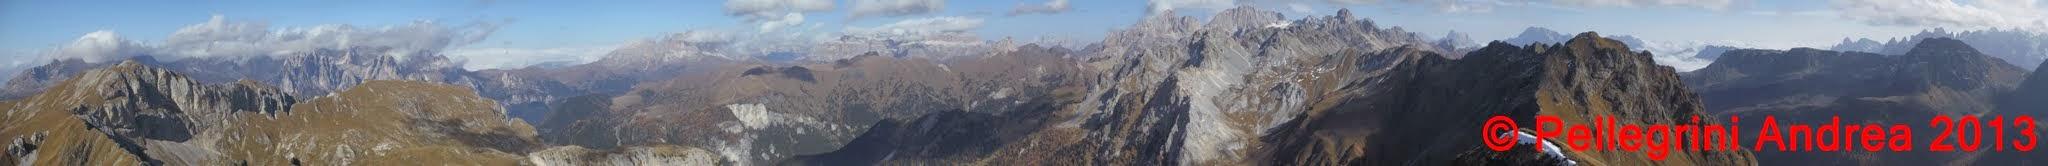 Photo: Panorama 12 panorama 360 da Cima Malinverno